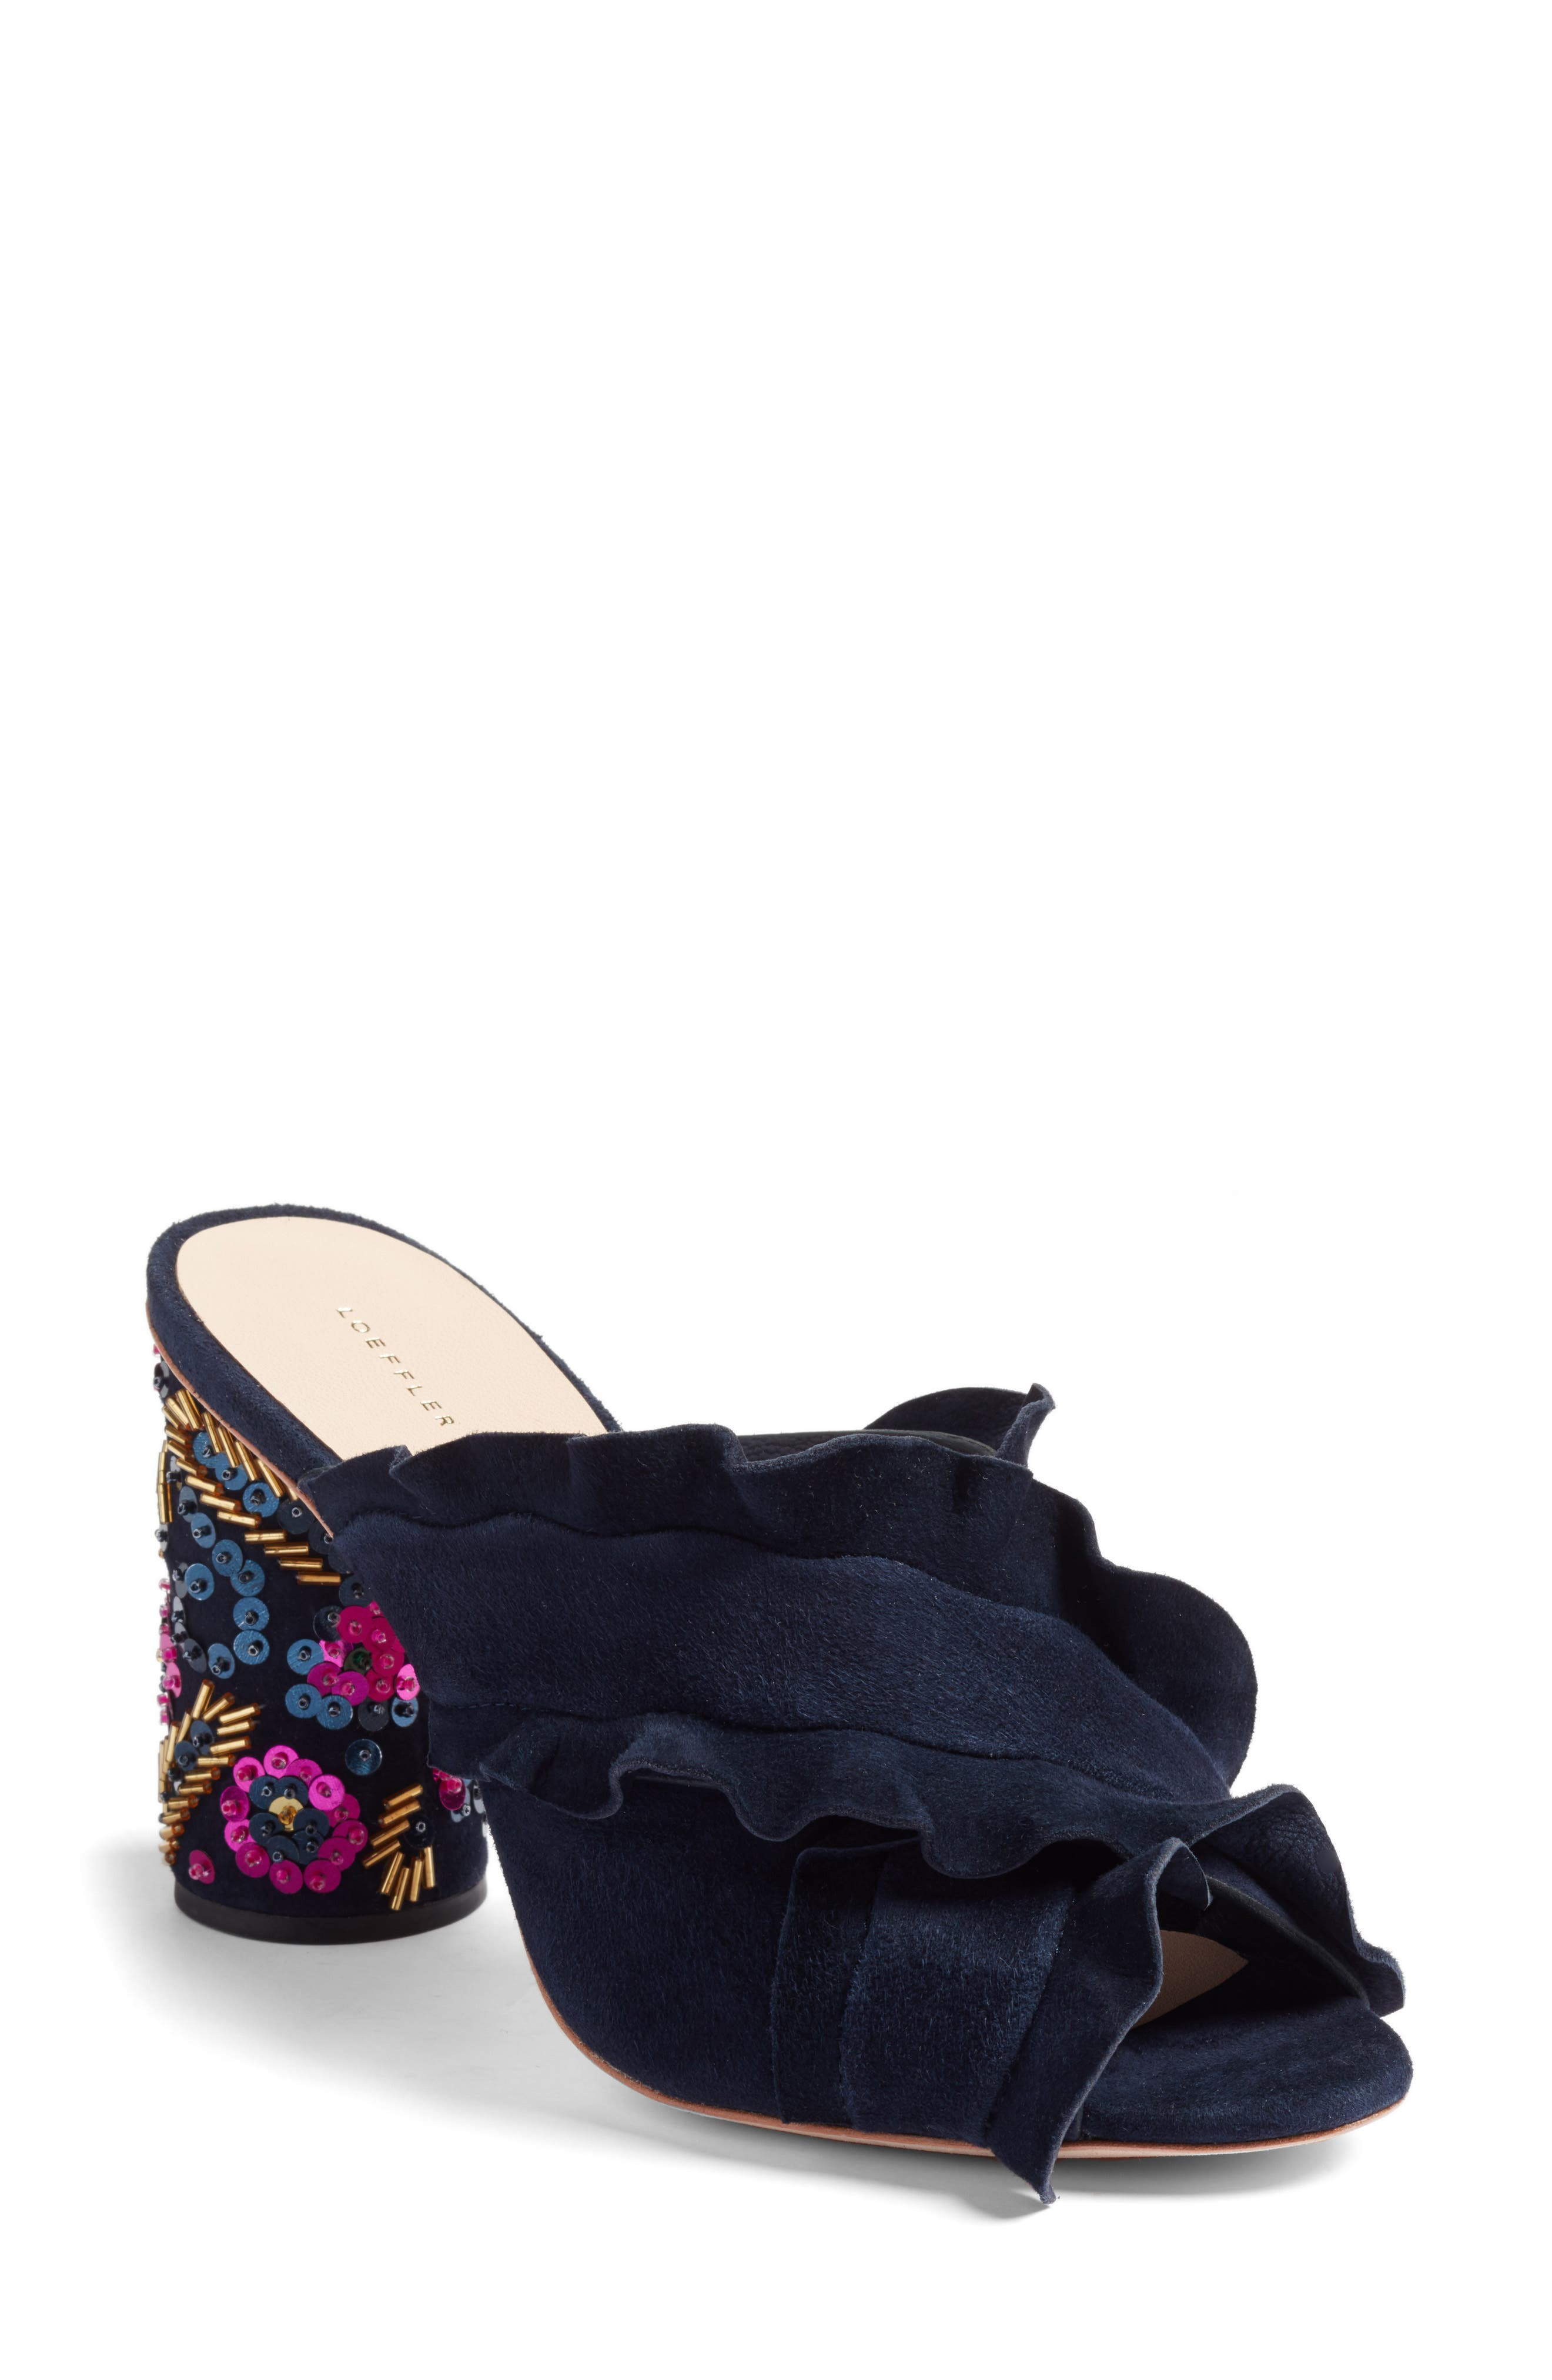 Alternate Image 1 Selected - Loeffler Randall Kaya Embellished Ruffle Slide Sandal (Women)